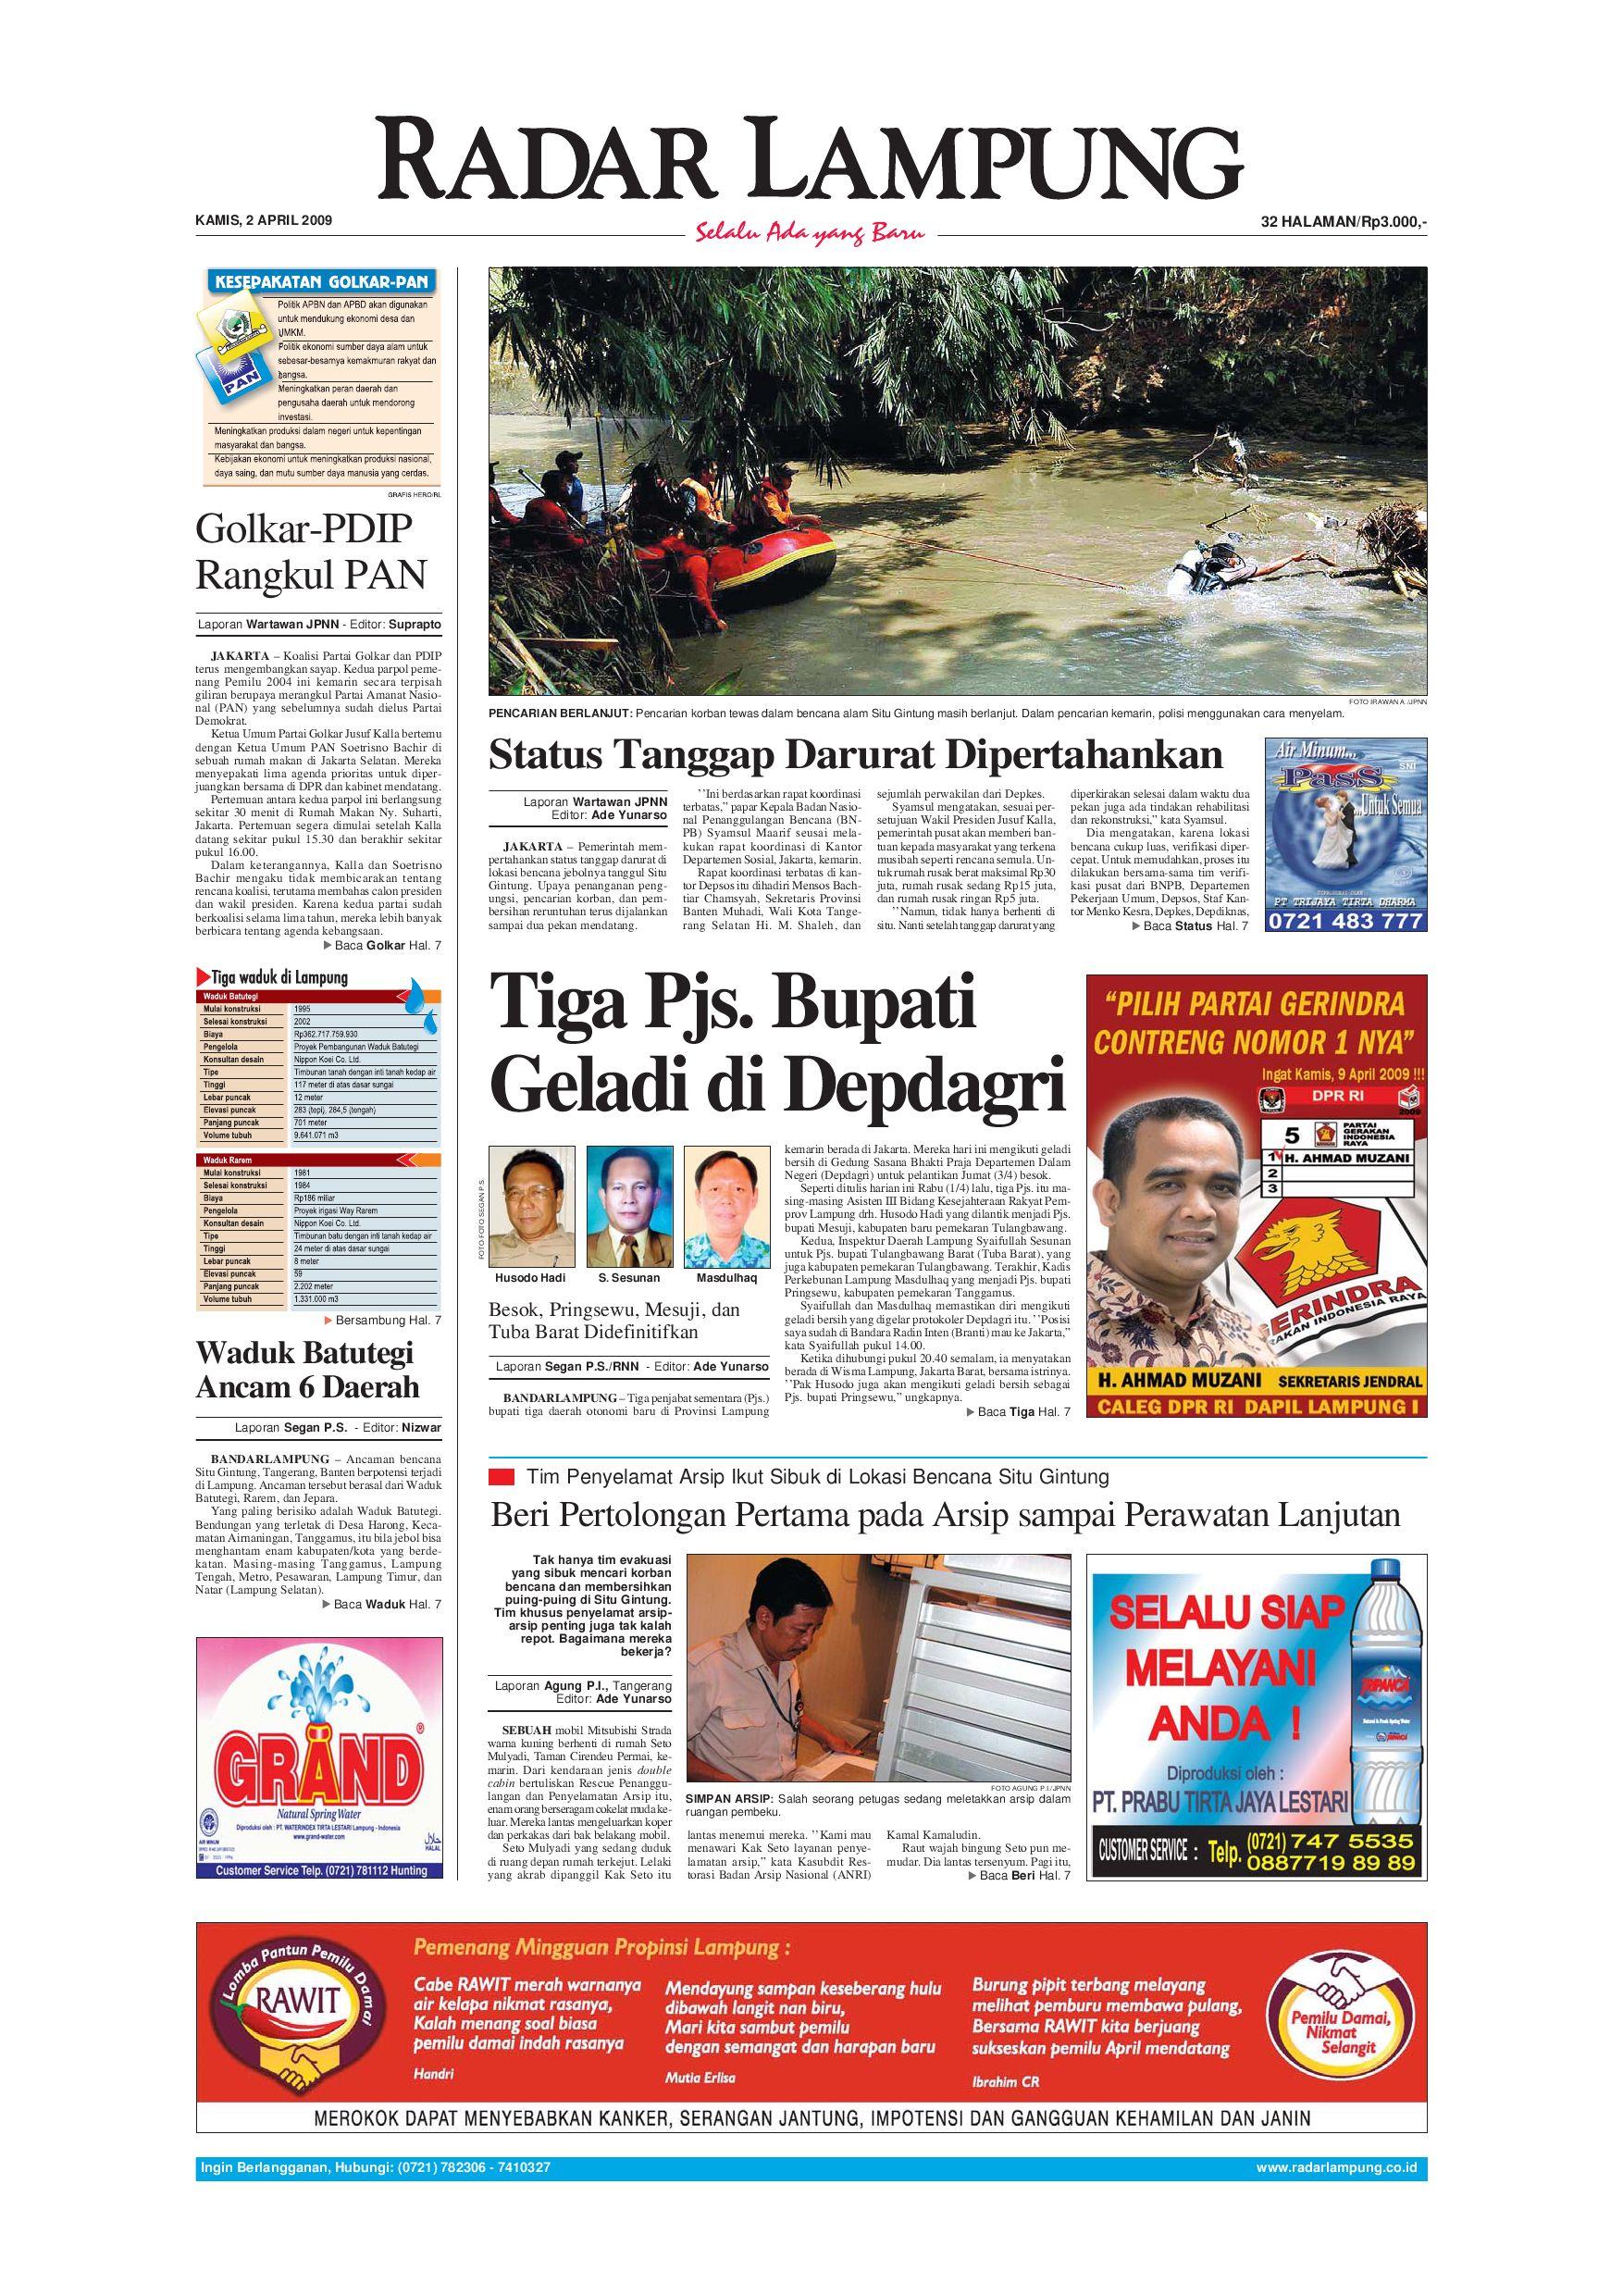 Radar Lampung Kamis 2 April 2009 By Issuu Tcash Vaganza 36 Produk Ukm Bumn Batik Print Motif3